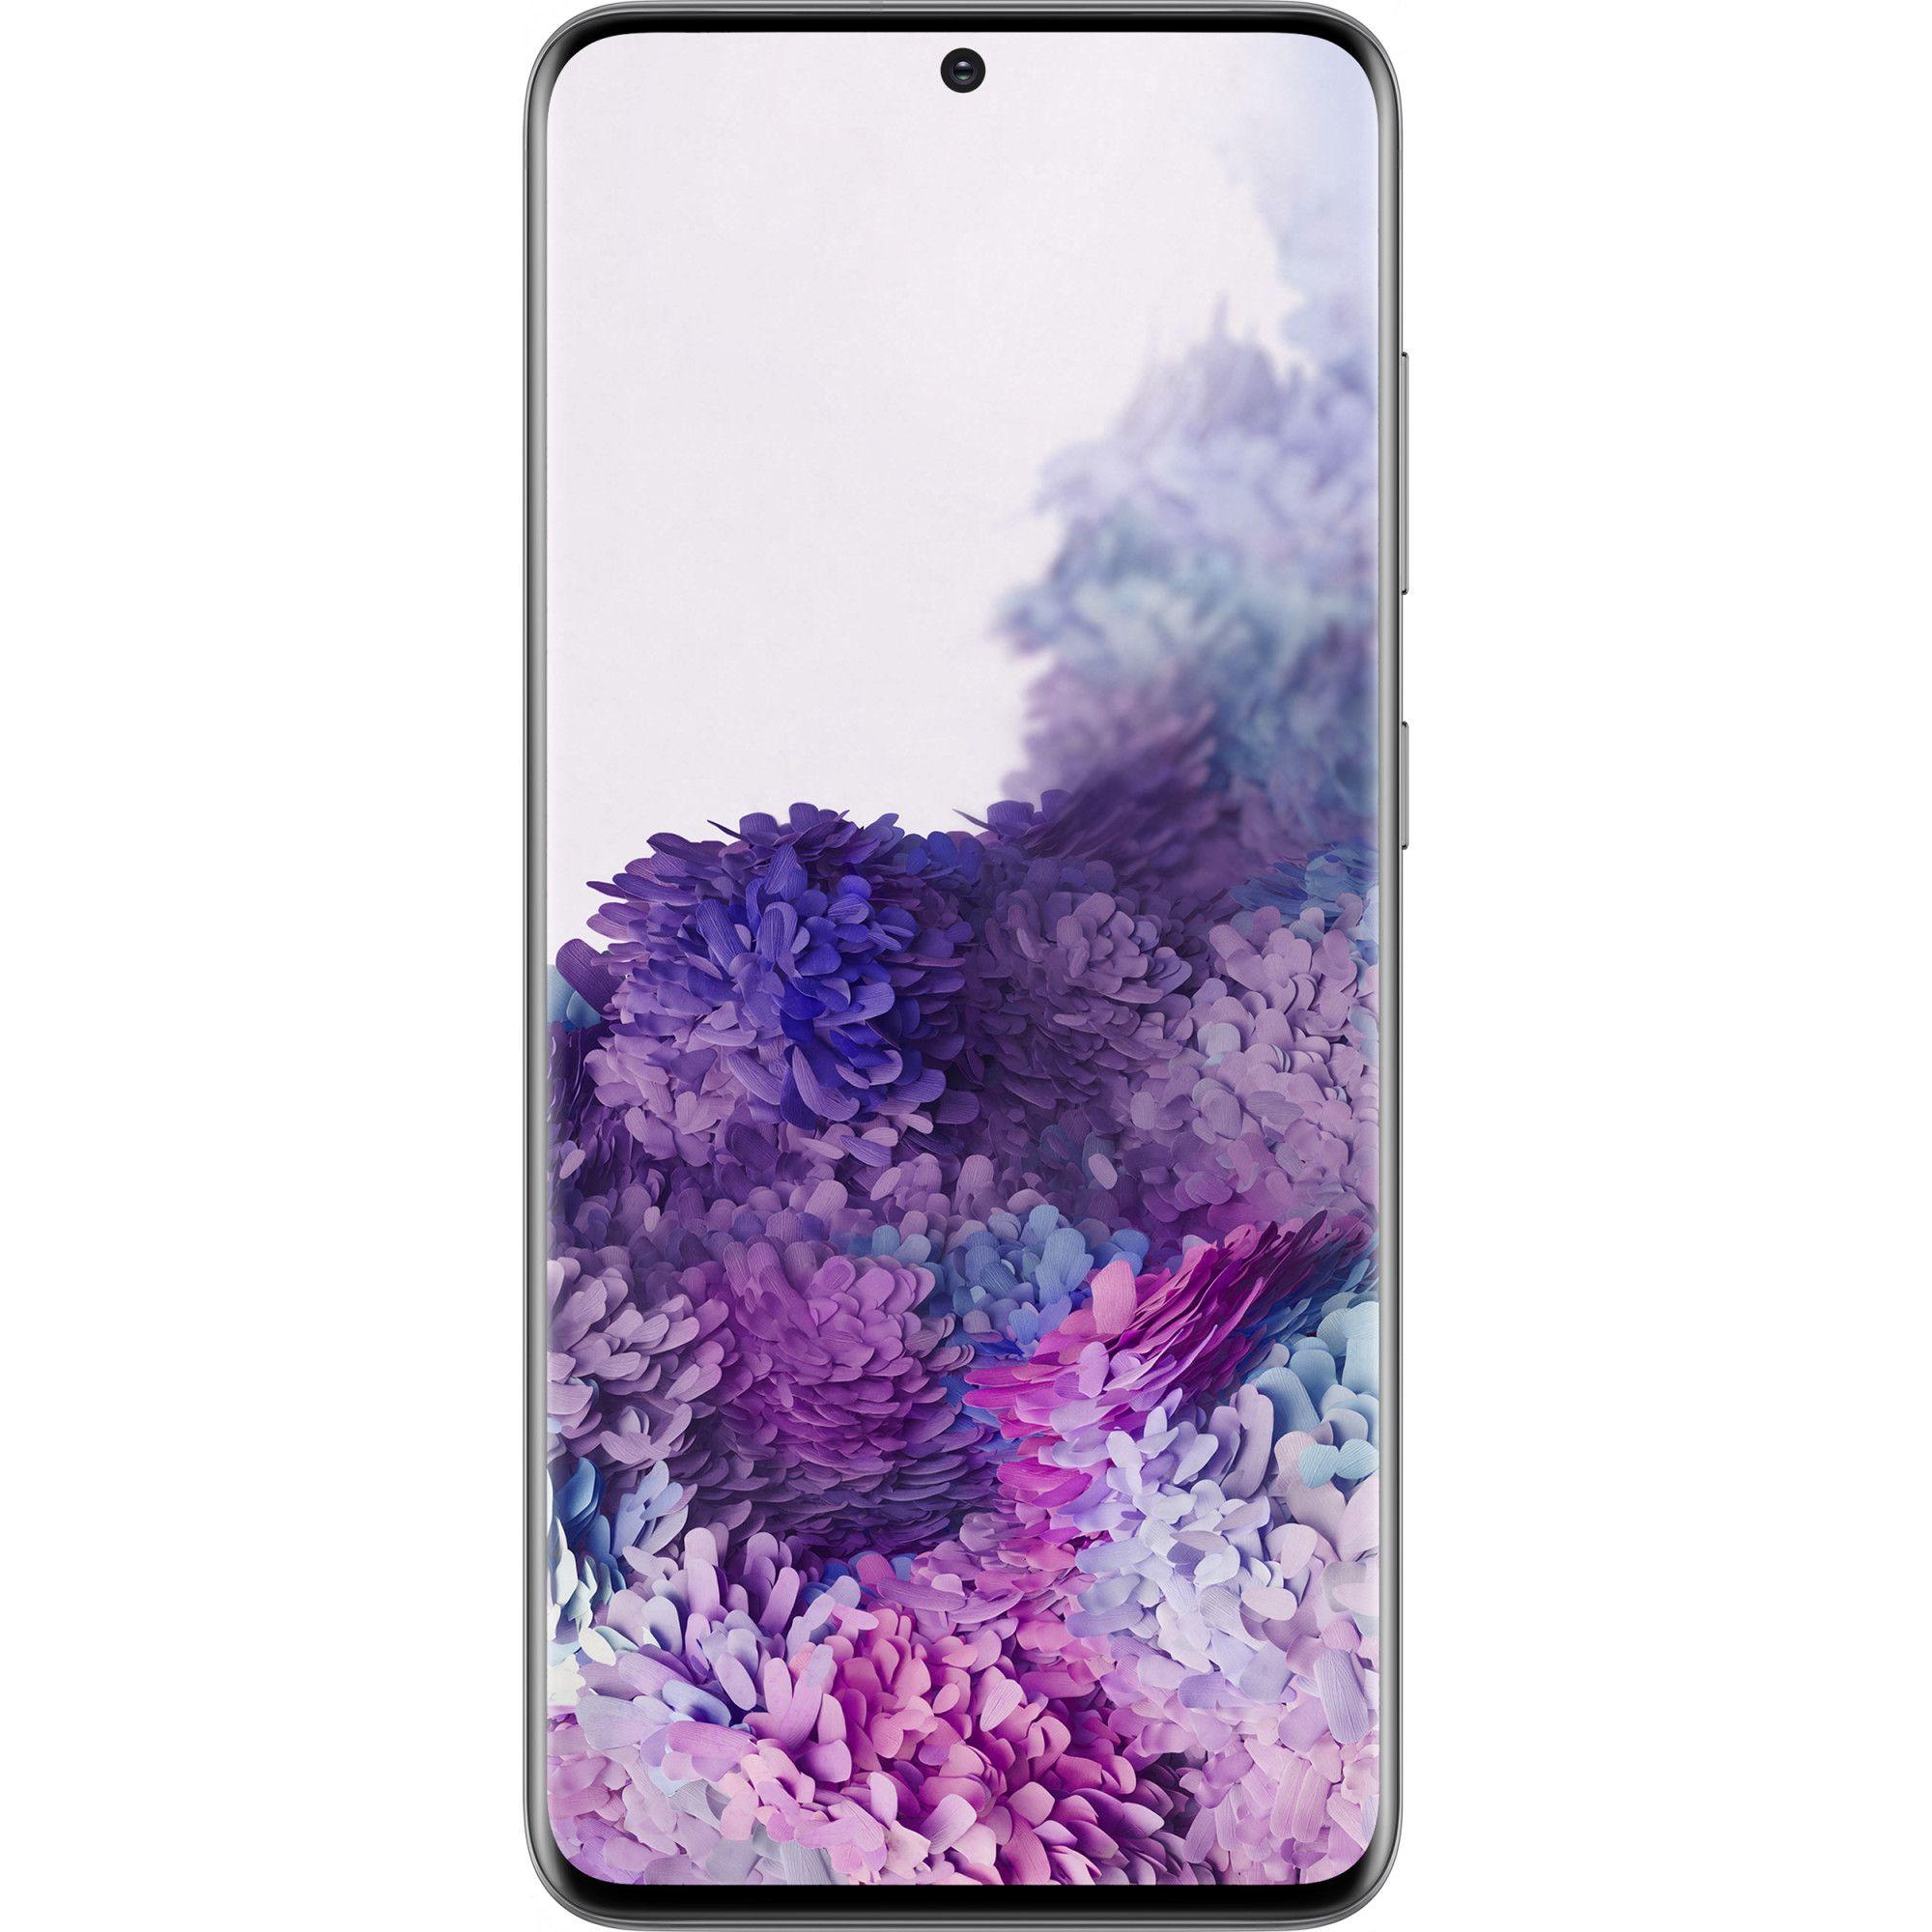 Telefon mobil Samsung Galaxy S20, Dual SIM, 128GB, 12GB RAM, 5G, Cosmic Gray